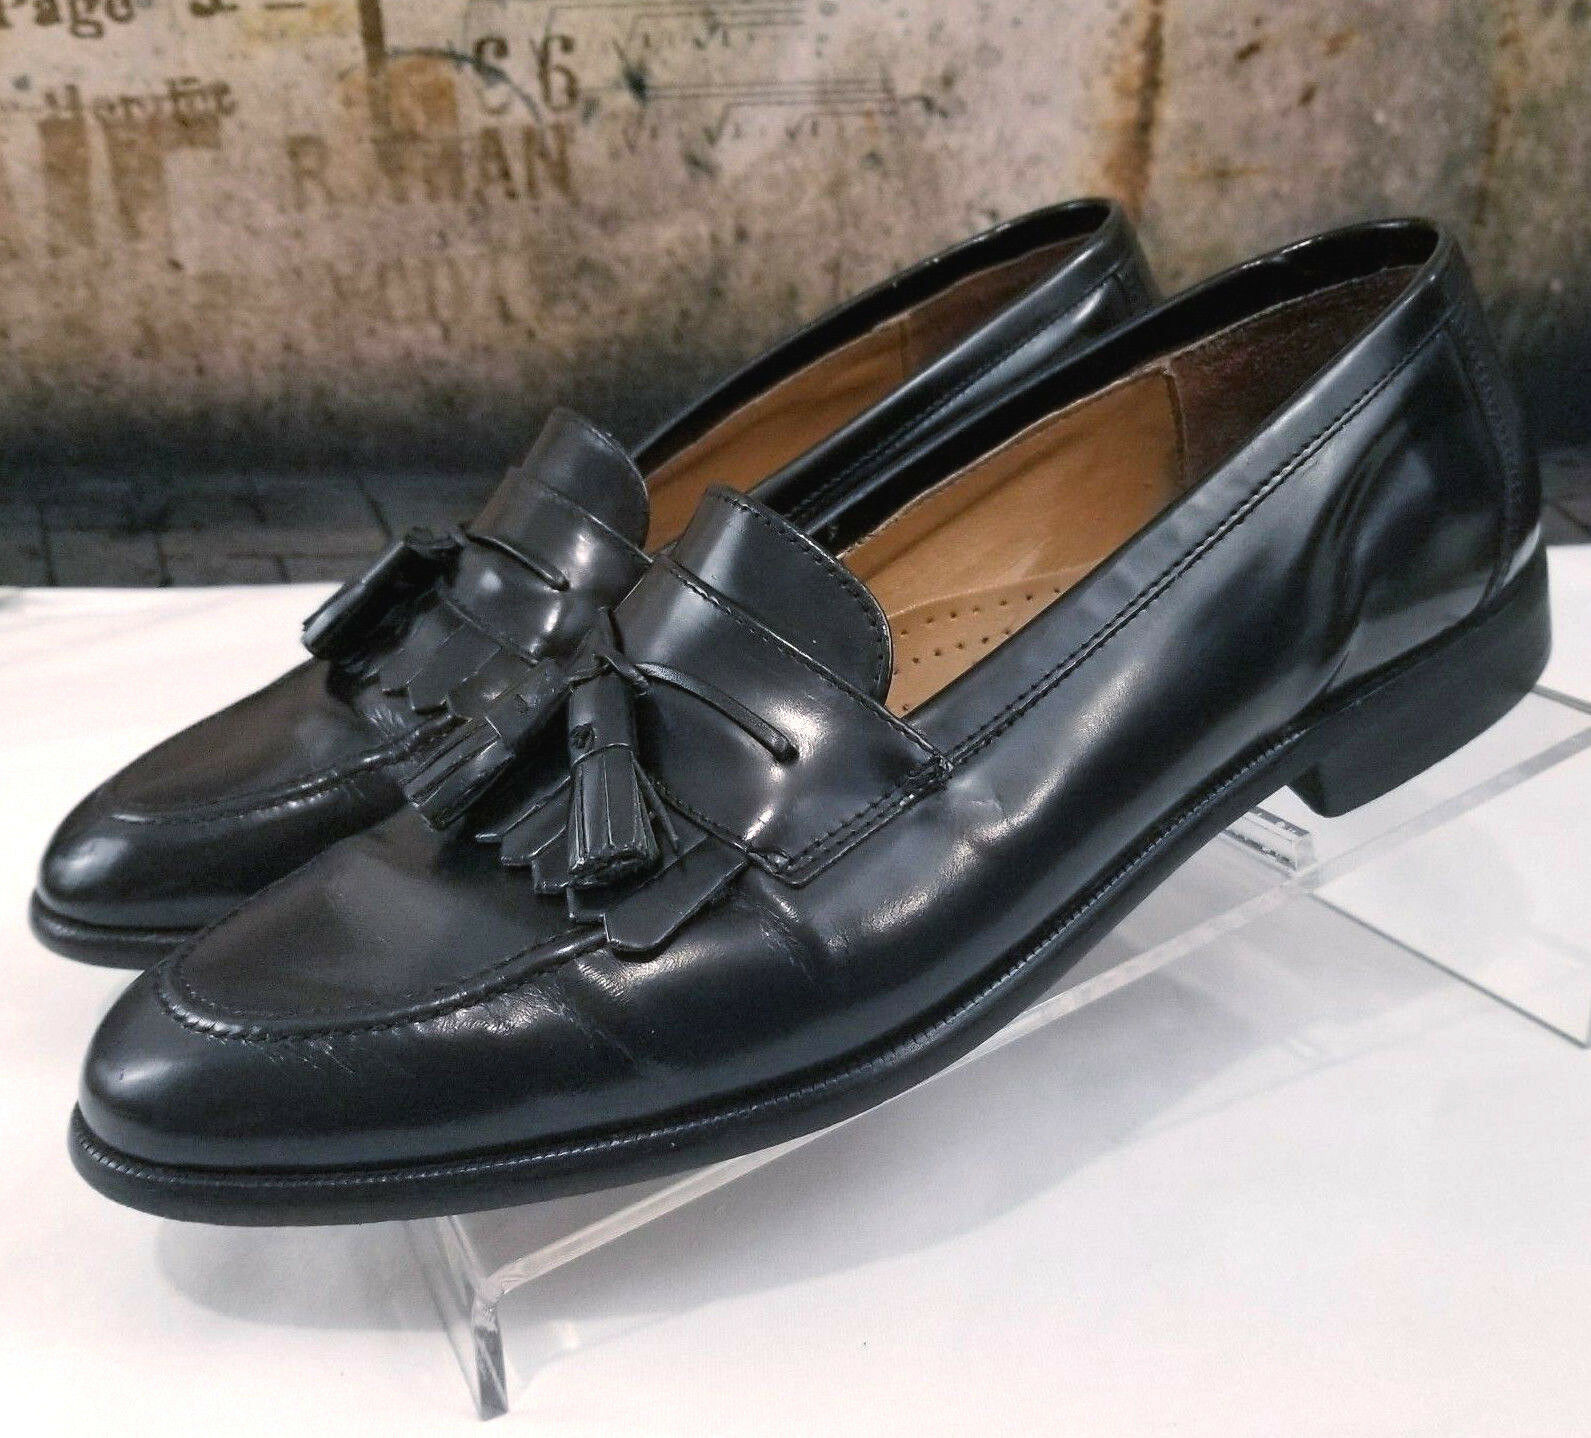 Giorgio Brutini Kiltie Tassel Moc Toe Black Leather D Shoes Loafers Size 9.5 D Leather d4541b